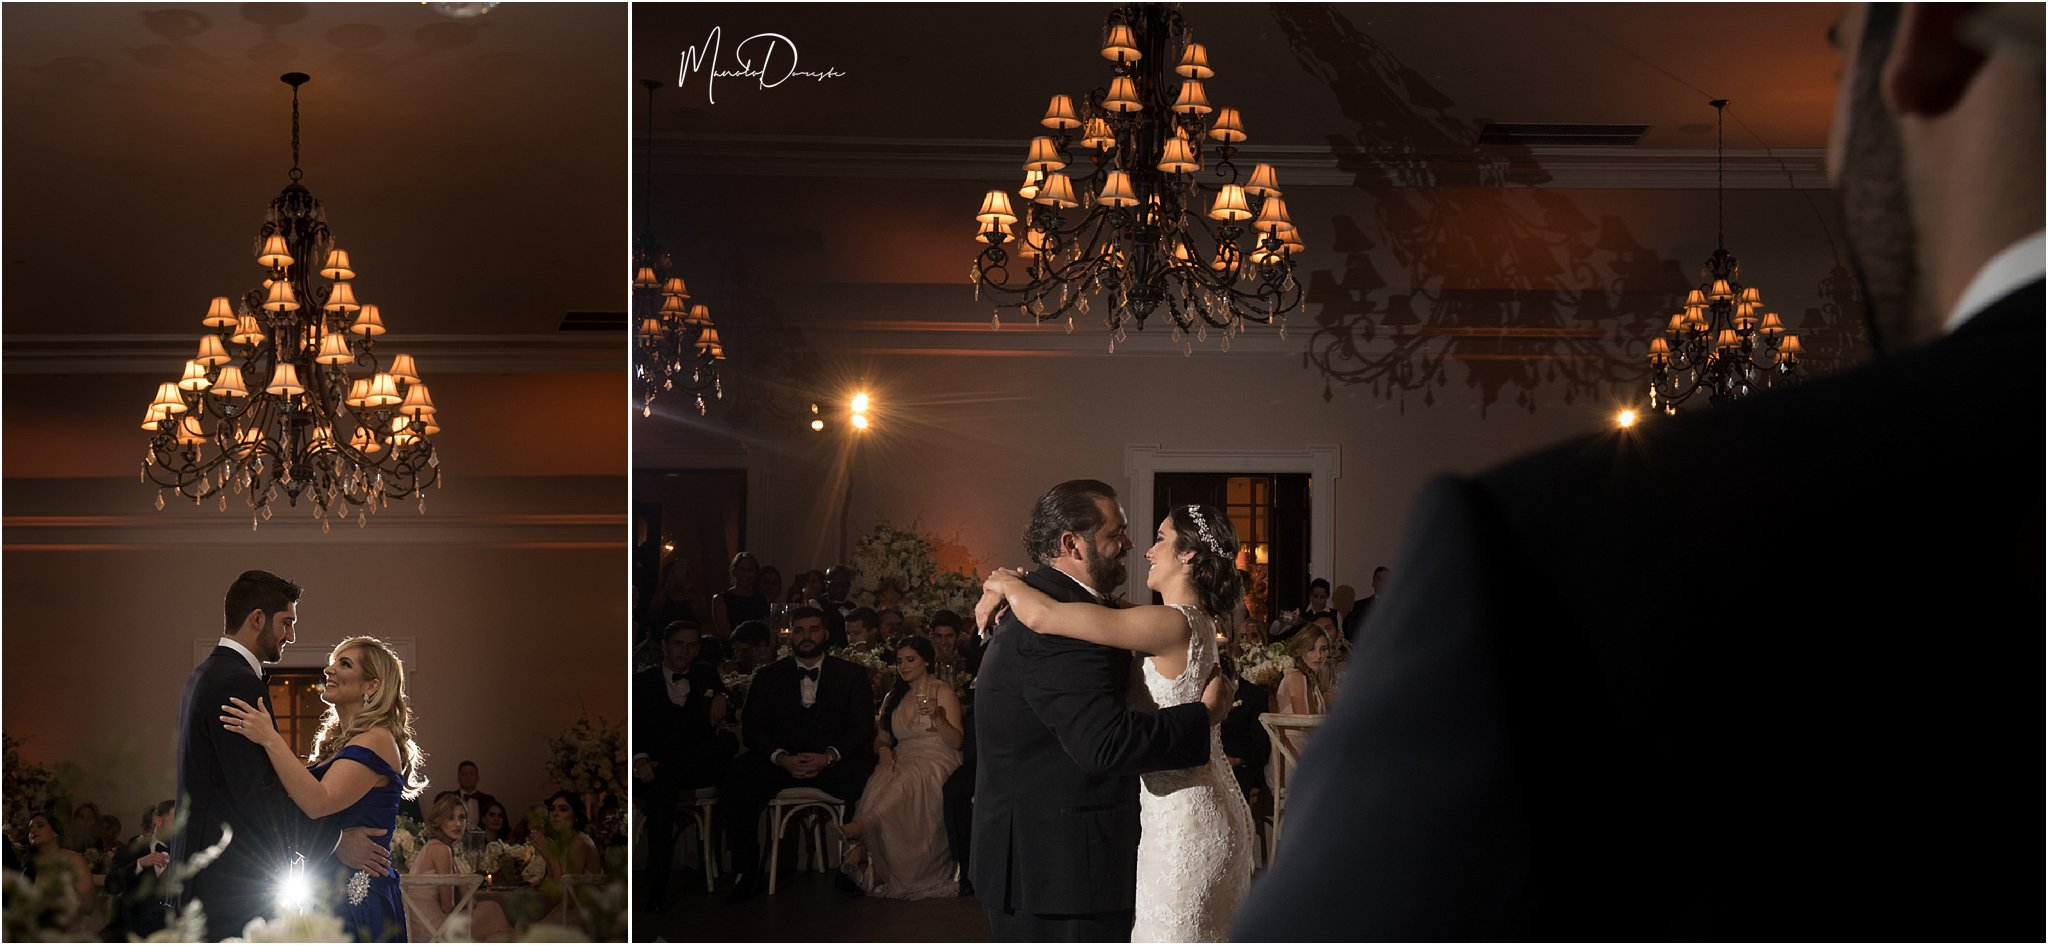 00944_ManoloDoreste_InFocusStudios_Wedding_Family_Photography_Miami_MiamiPhotographer.jpg